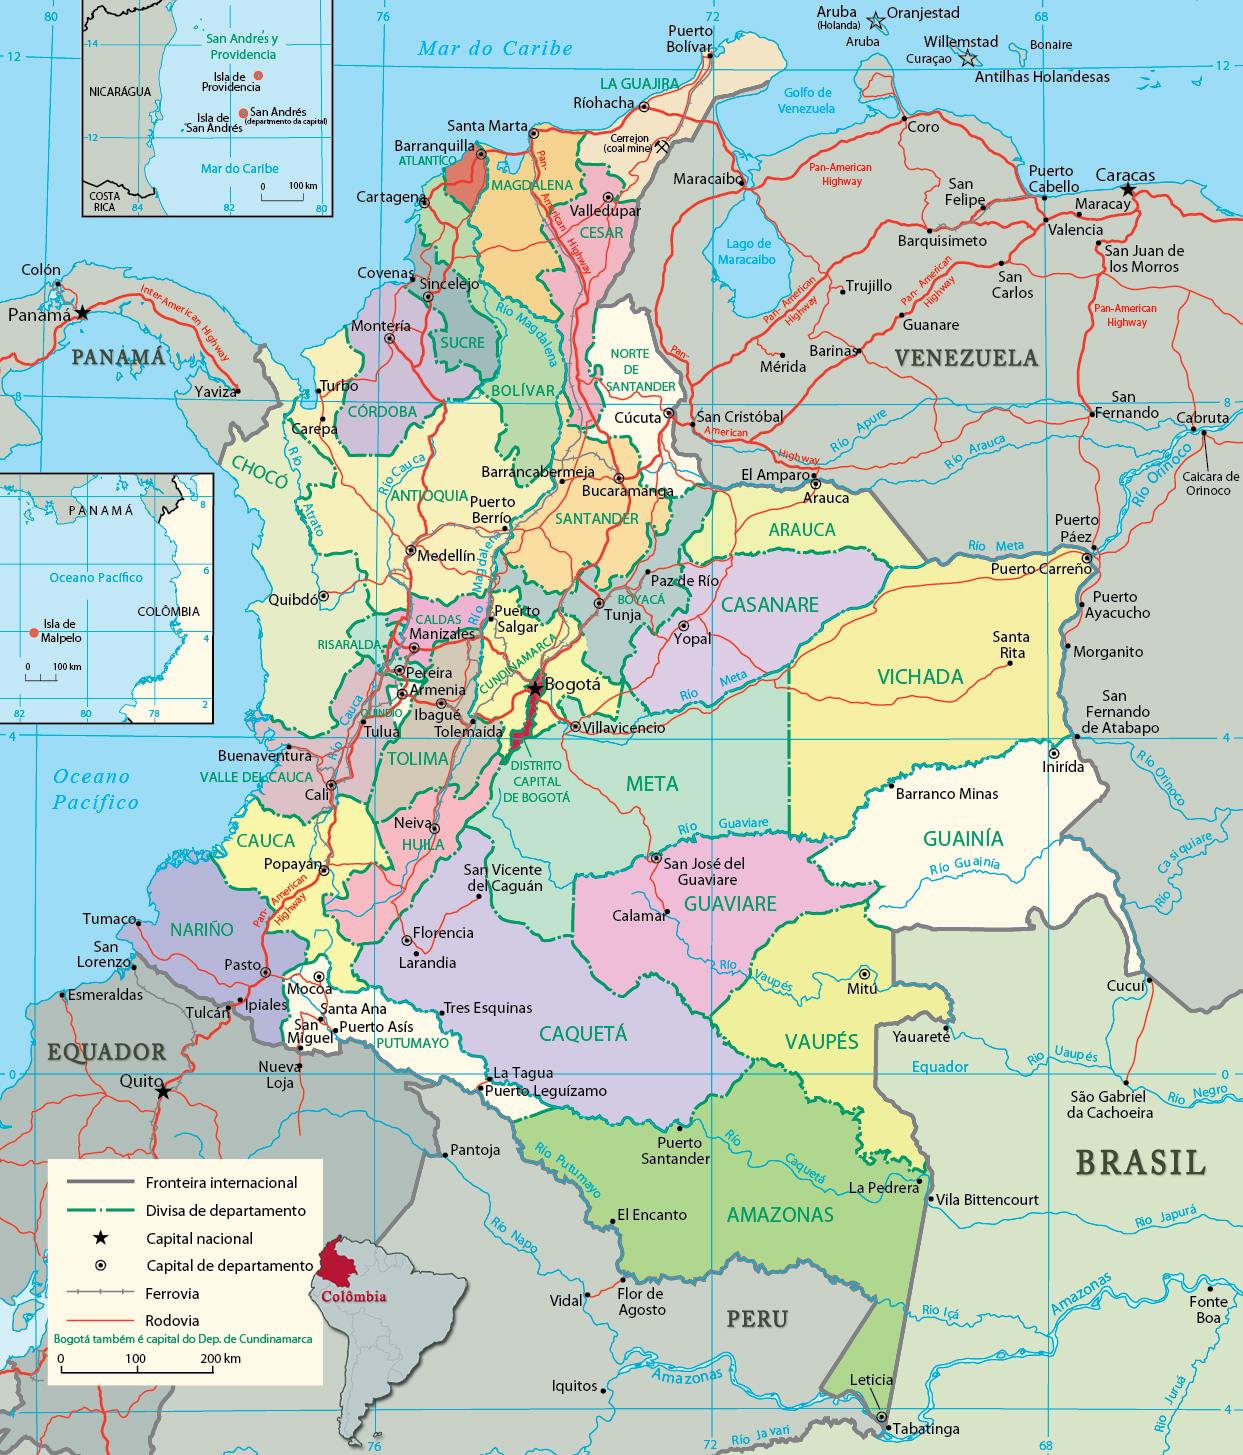 87 Mapa Fsico De Colombia Tamao Completo Al Final  : Mapa2Bpolitico2Bde2BColombia2Bhd2B2 from motocyclenews.top size 1243 x 1455 jpeg 1085kB